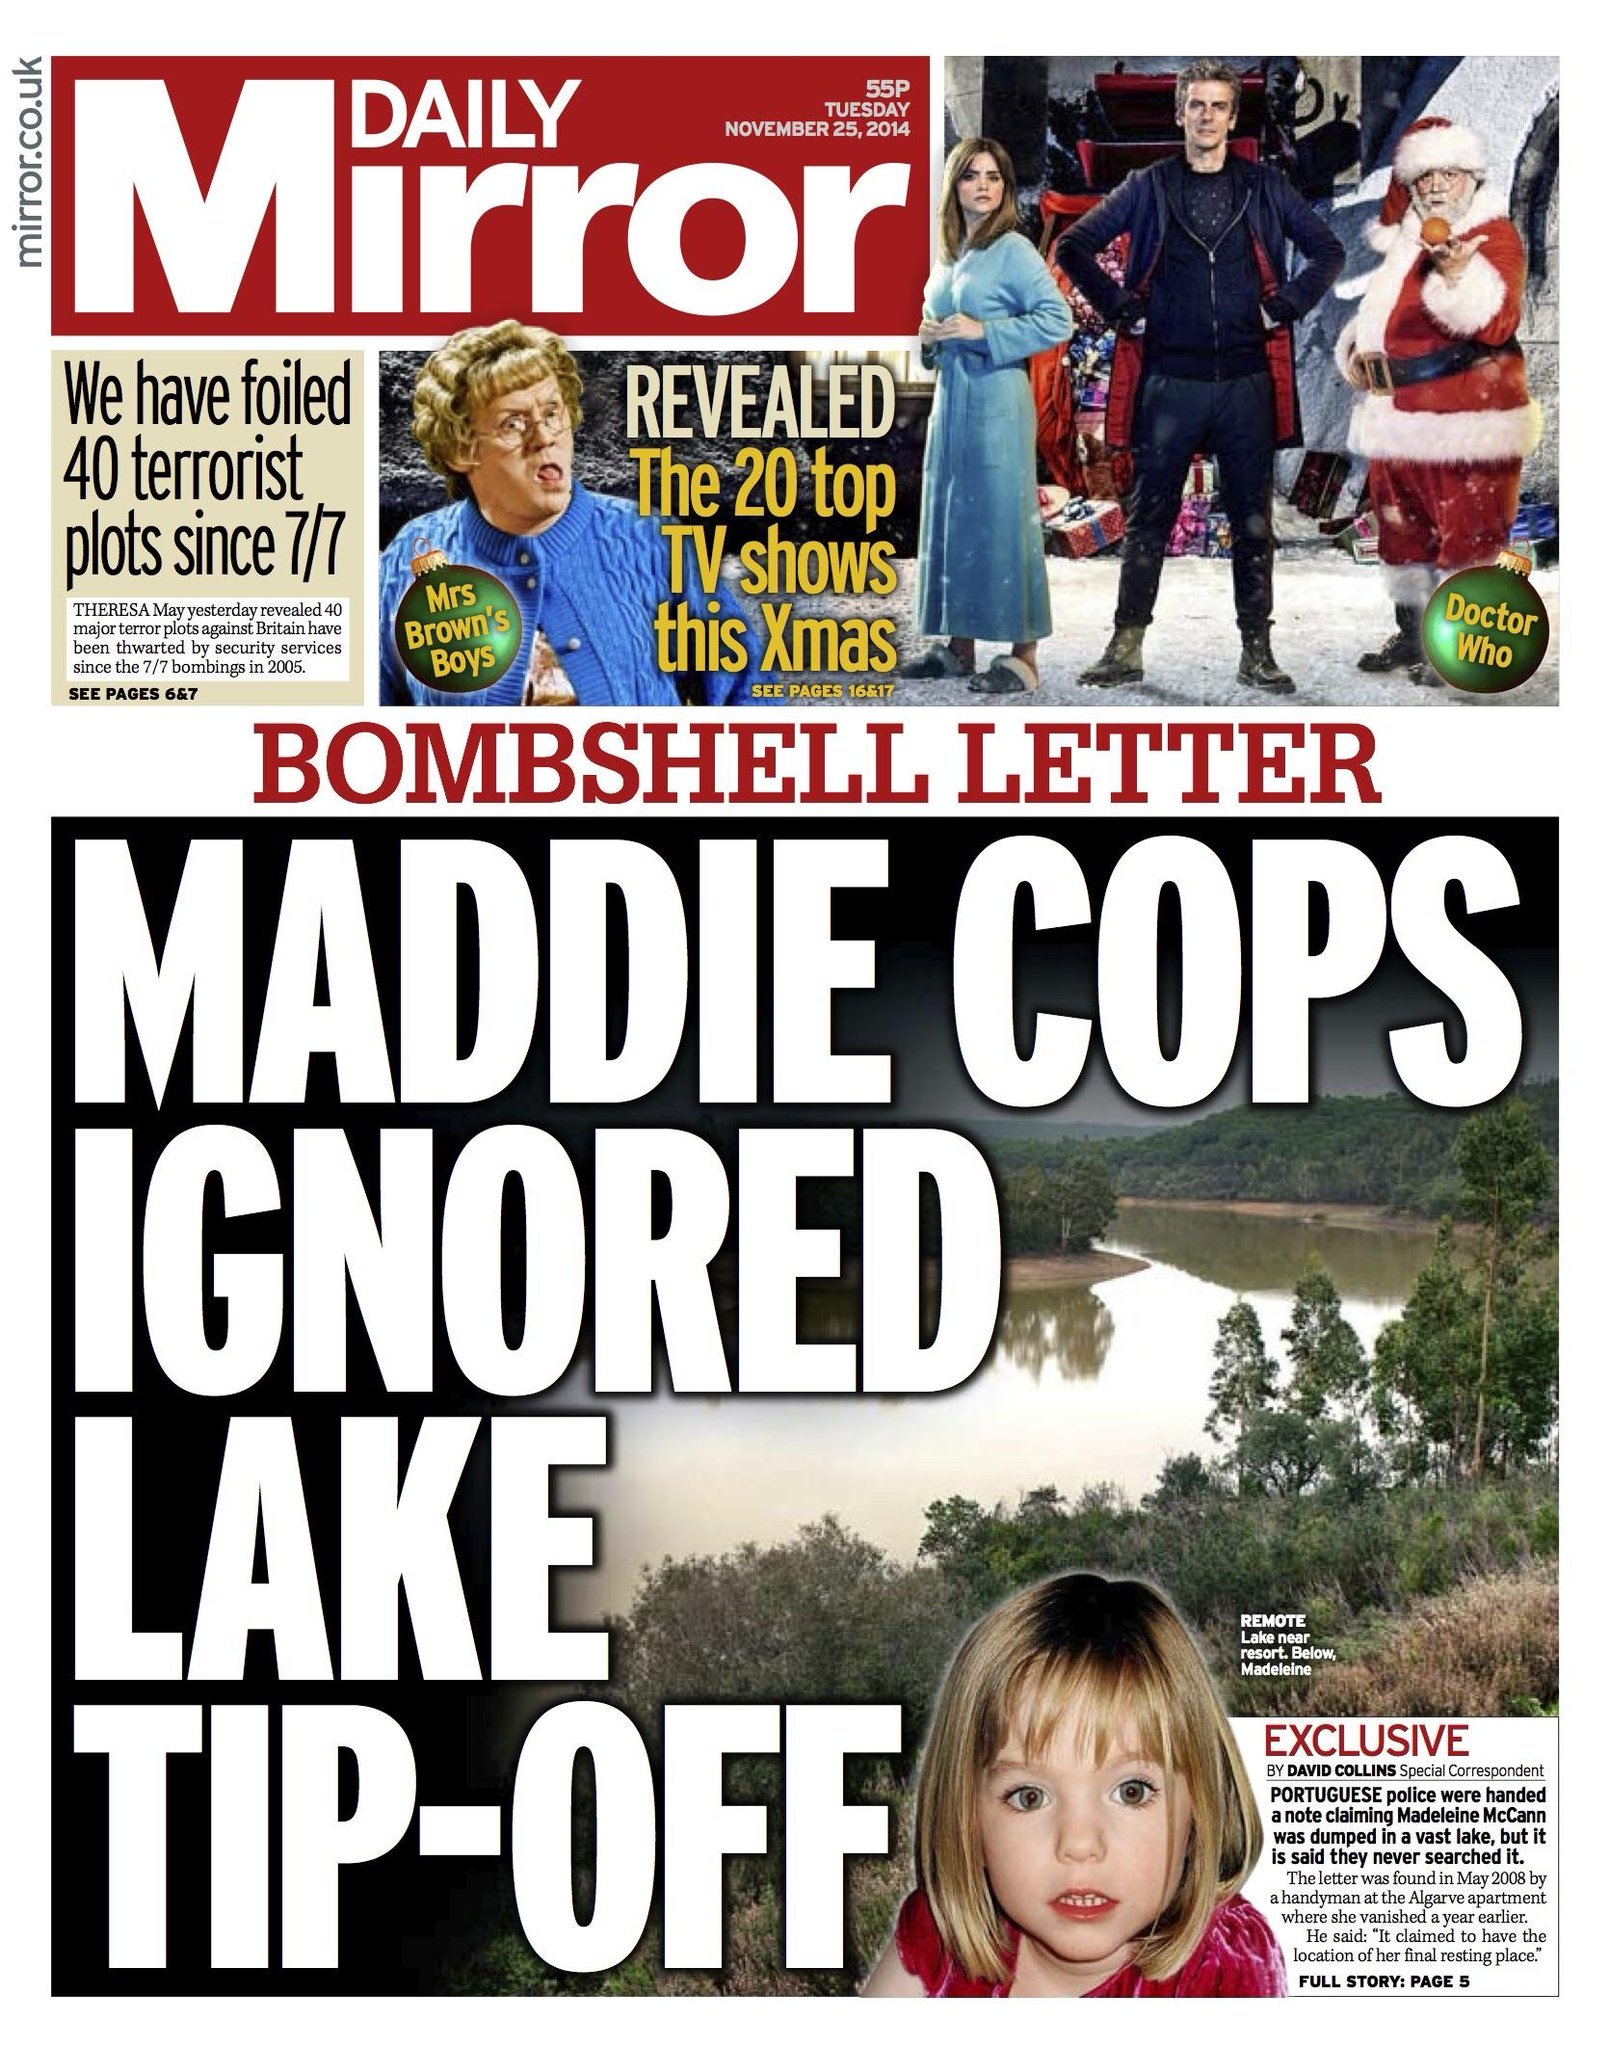 Maddie cops ignored lake tip-off - Daily Mirror 25/11/14 B3PaOv-IUAA_Qaq